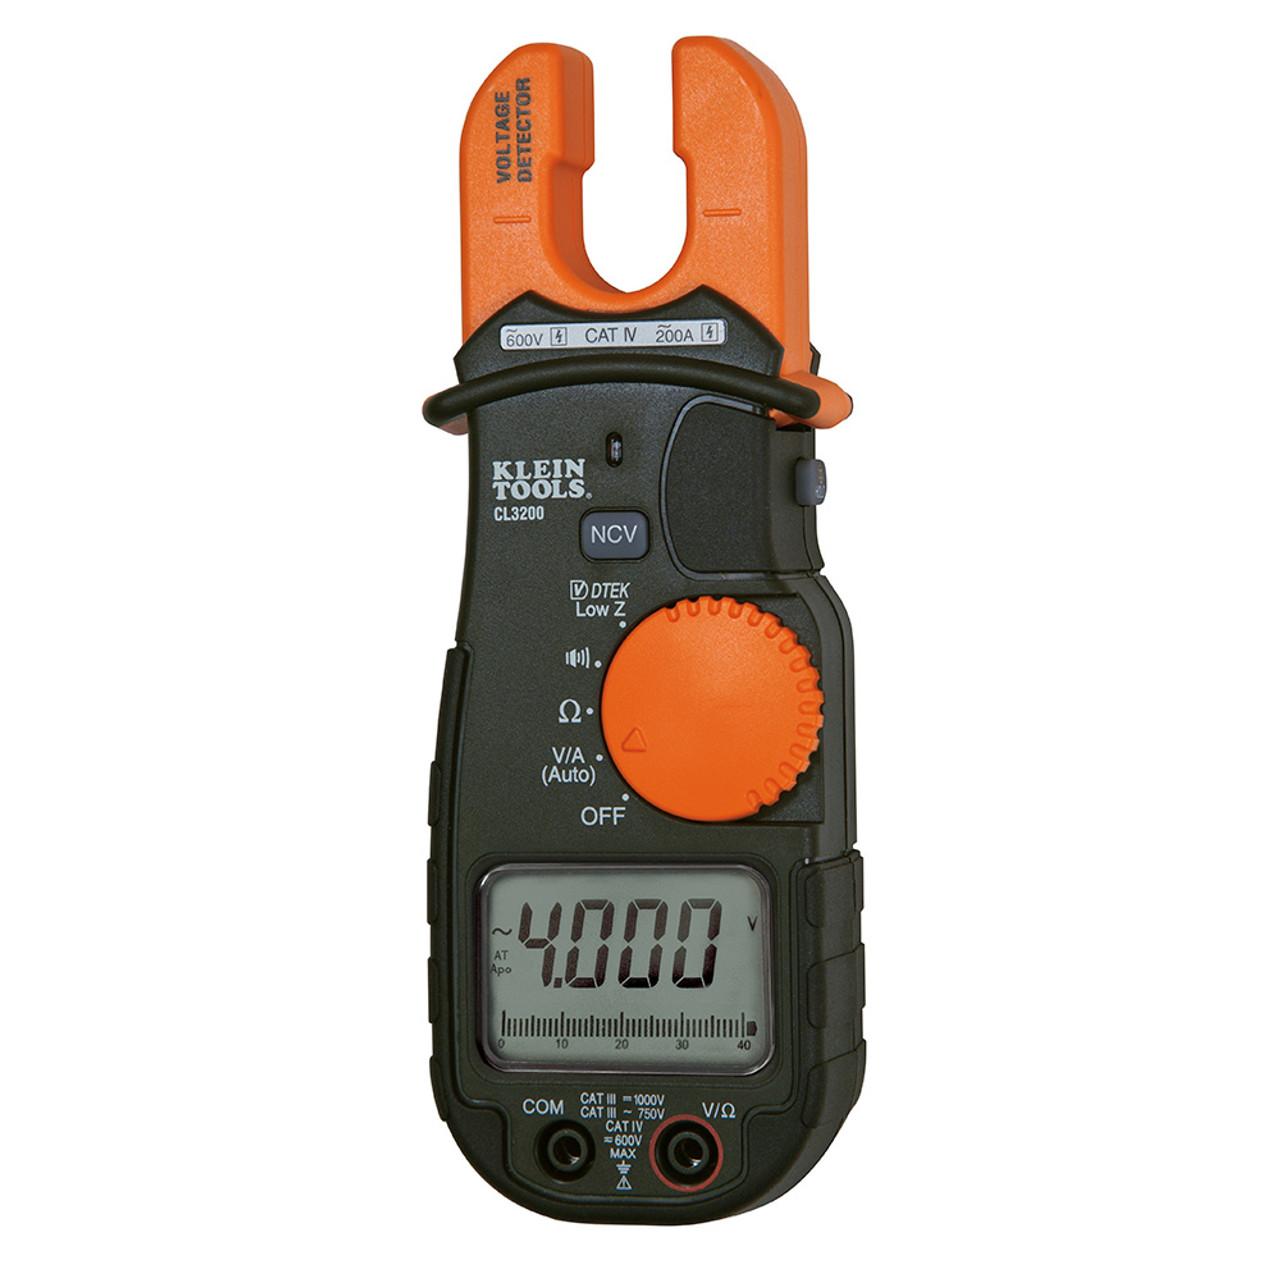 Klein CL3200 200A AC Fork Tester